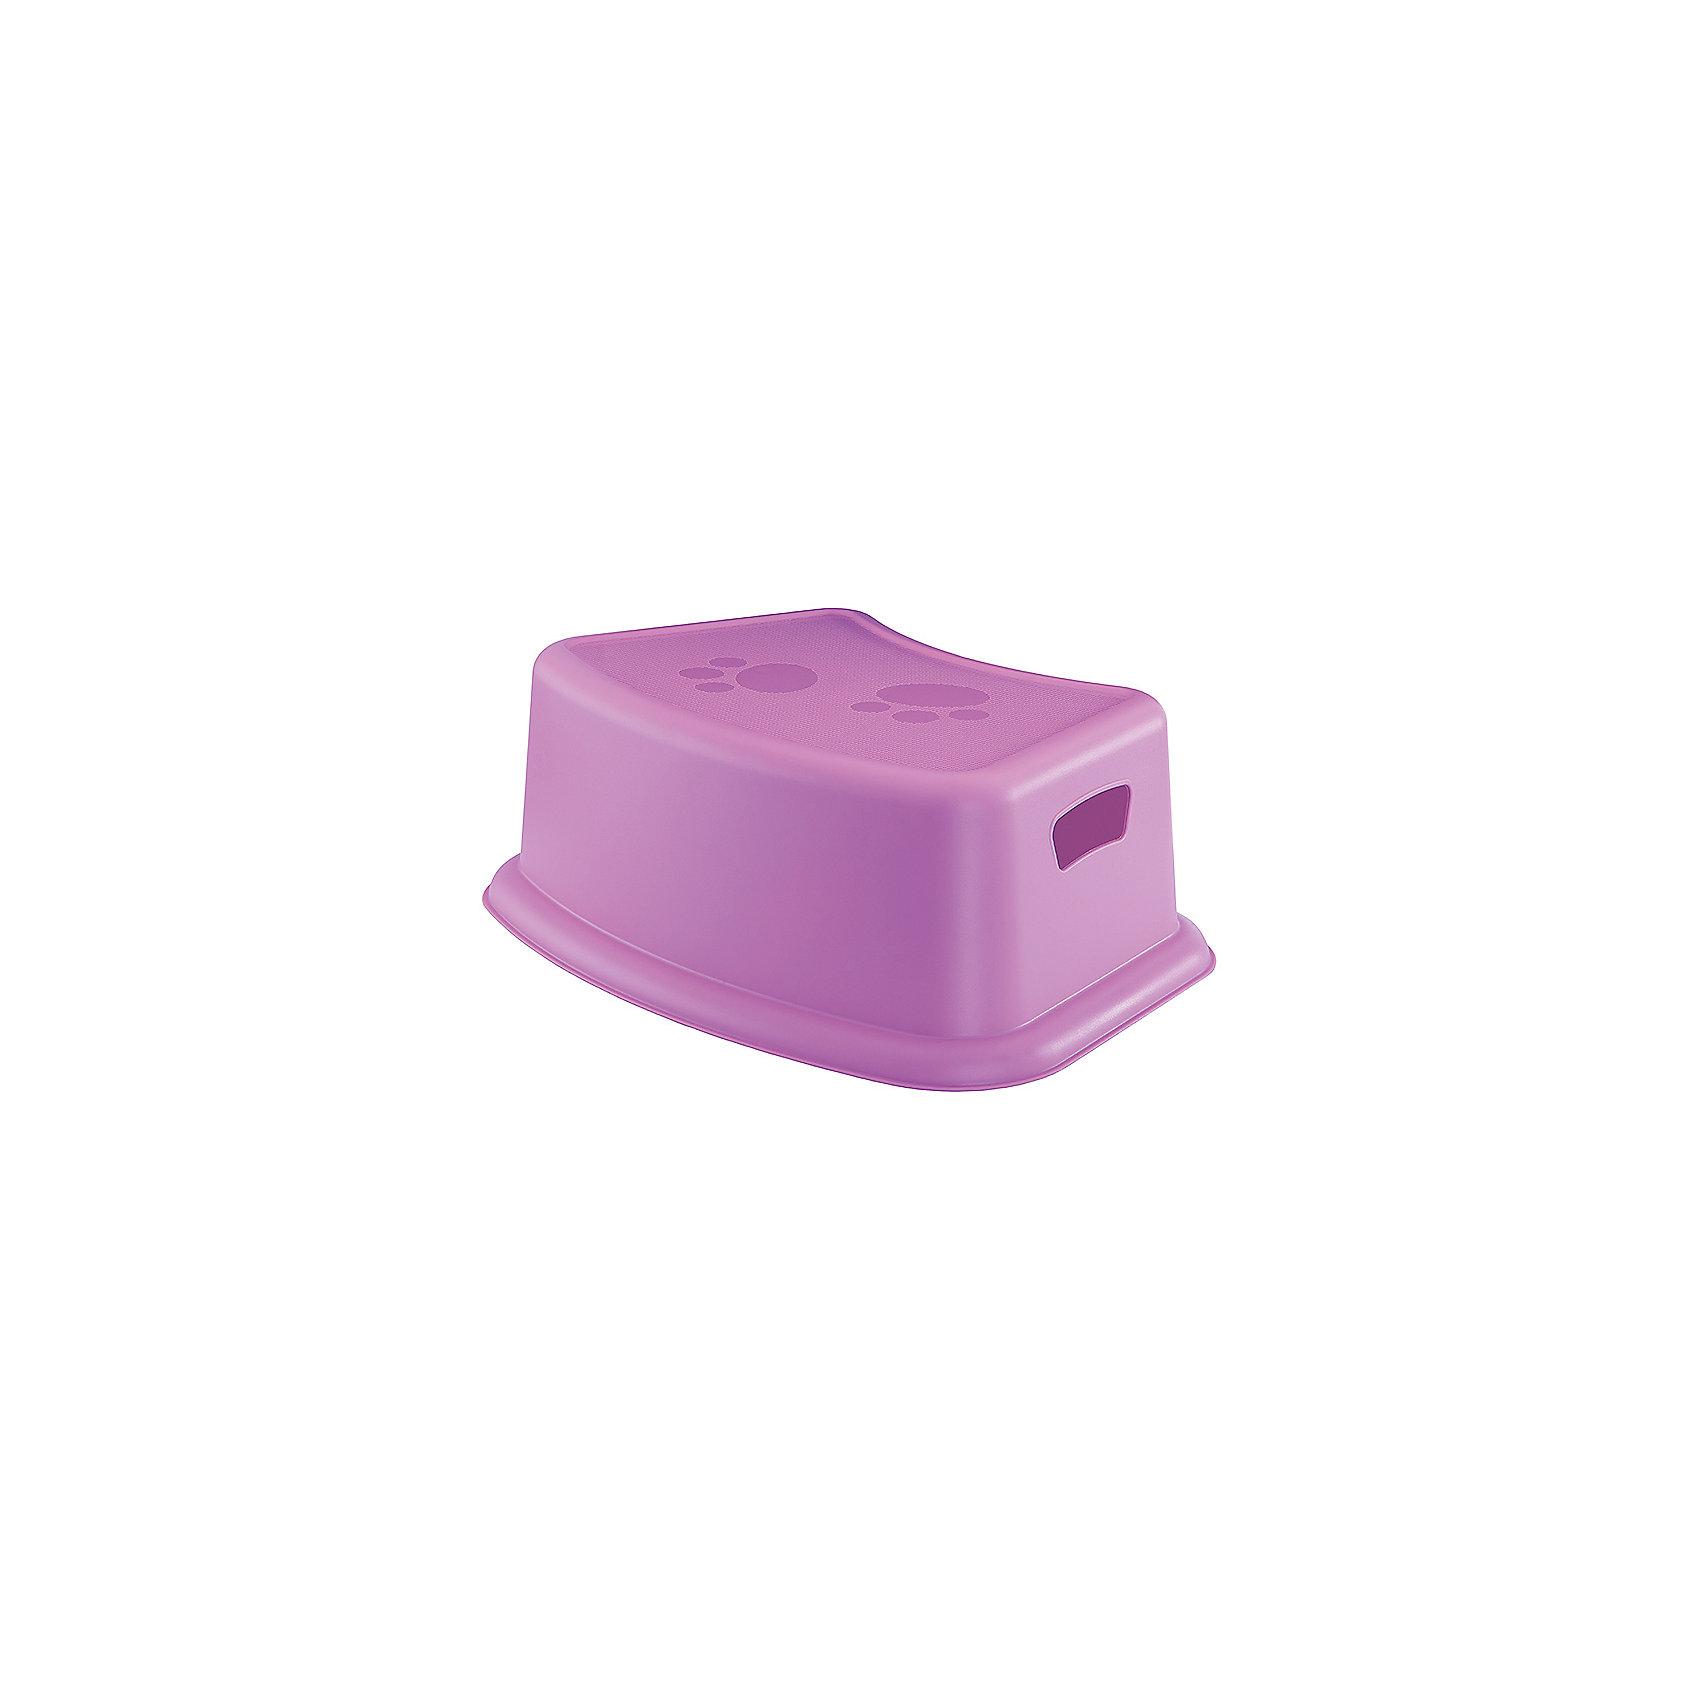 Пластишка Подставка Пластишка, пластишка горка для купания детей пластишка